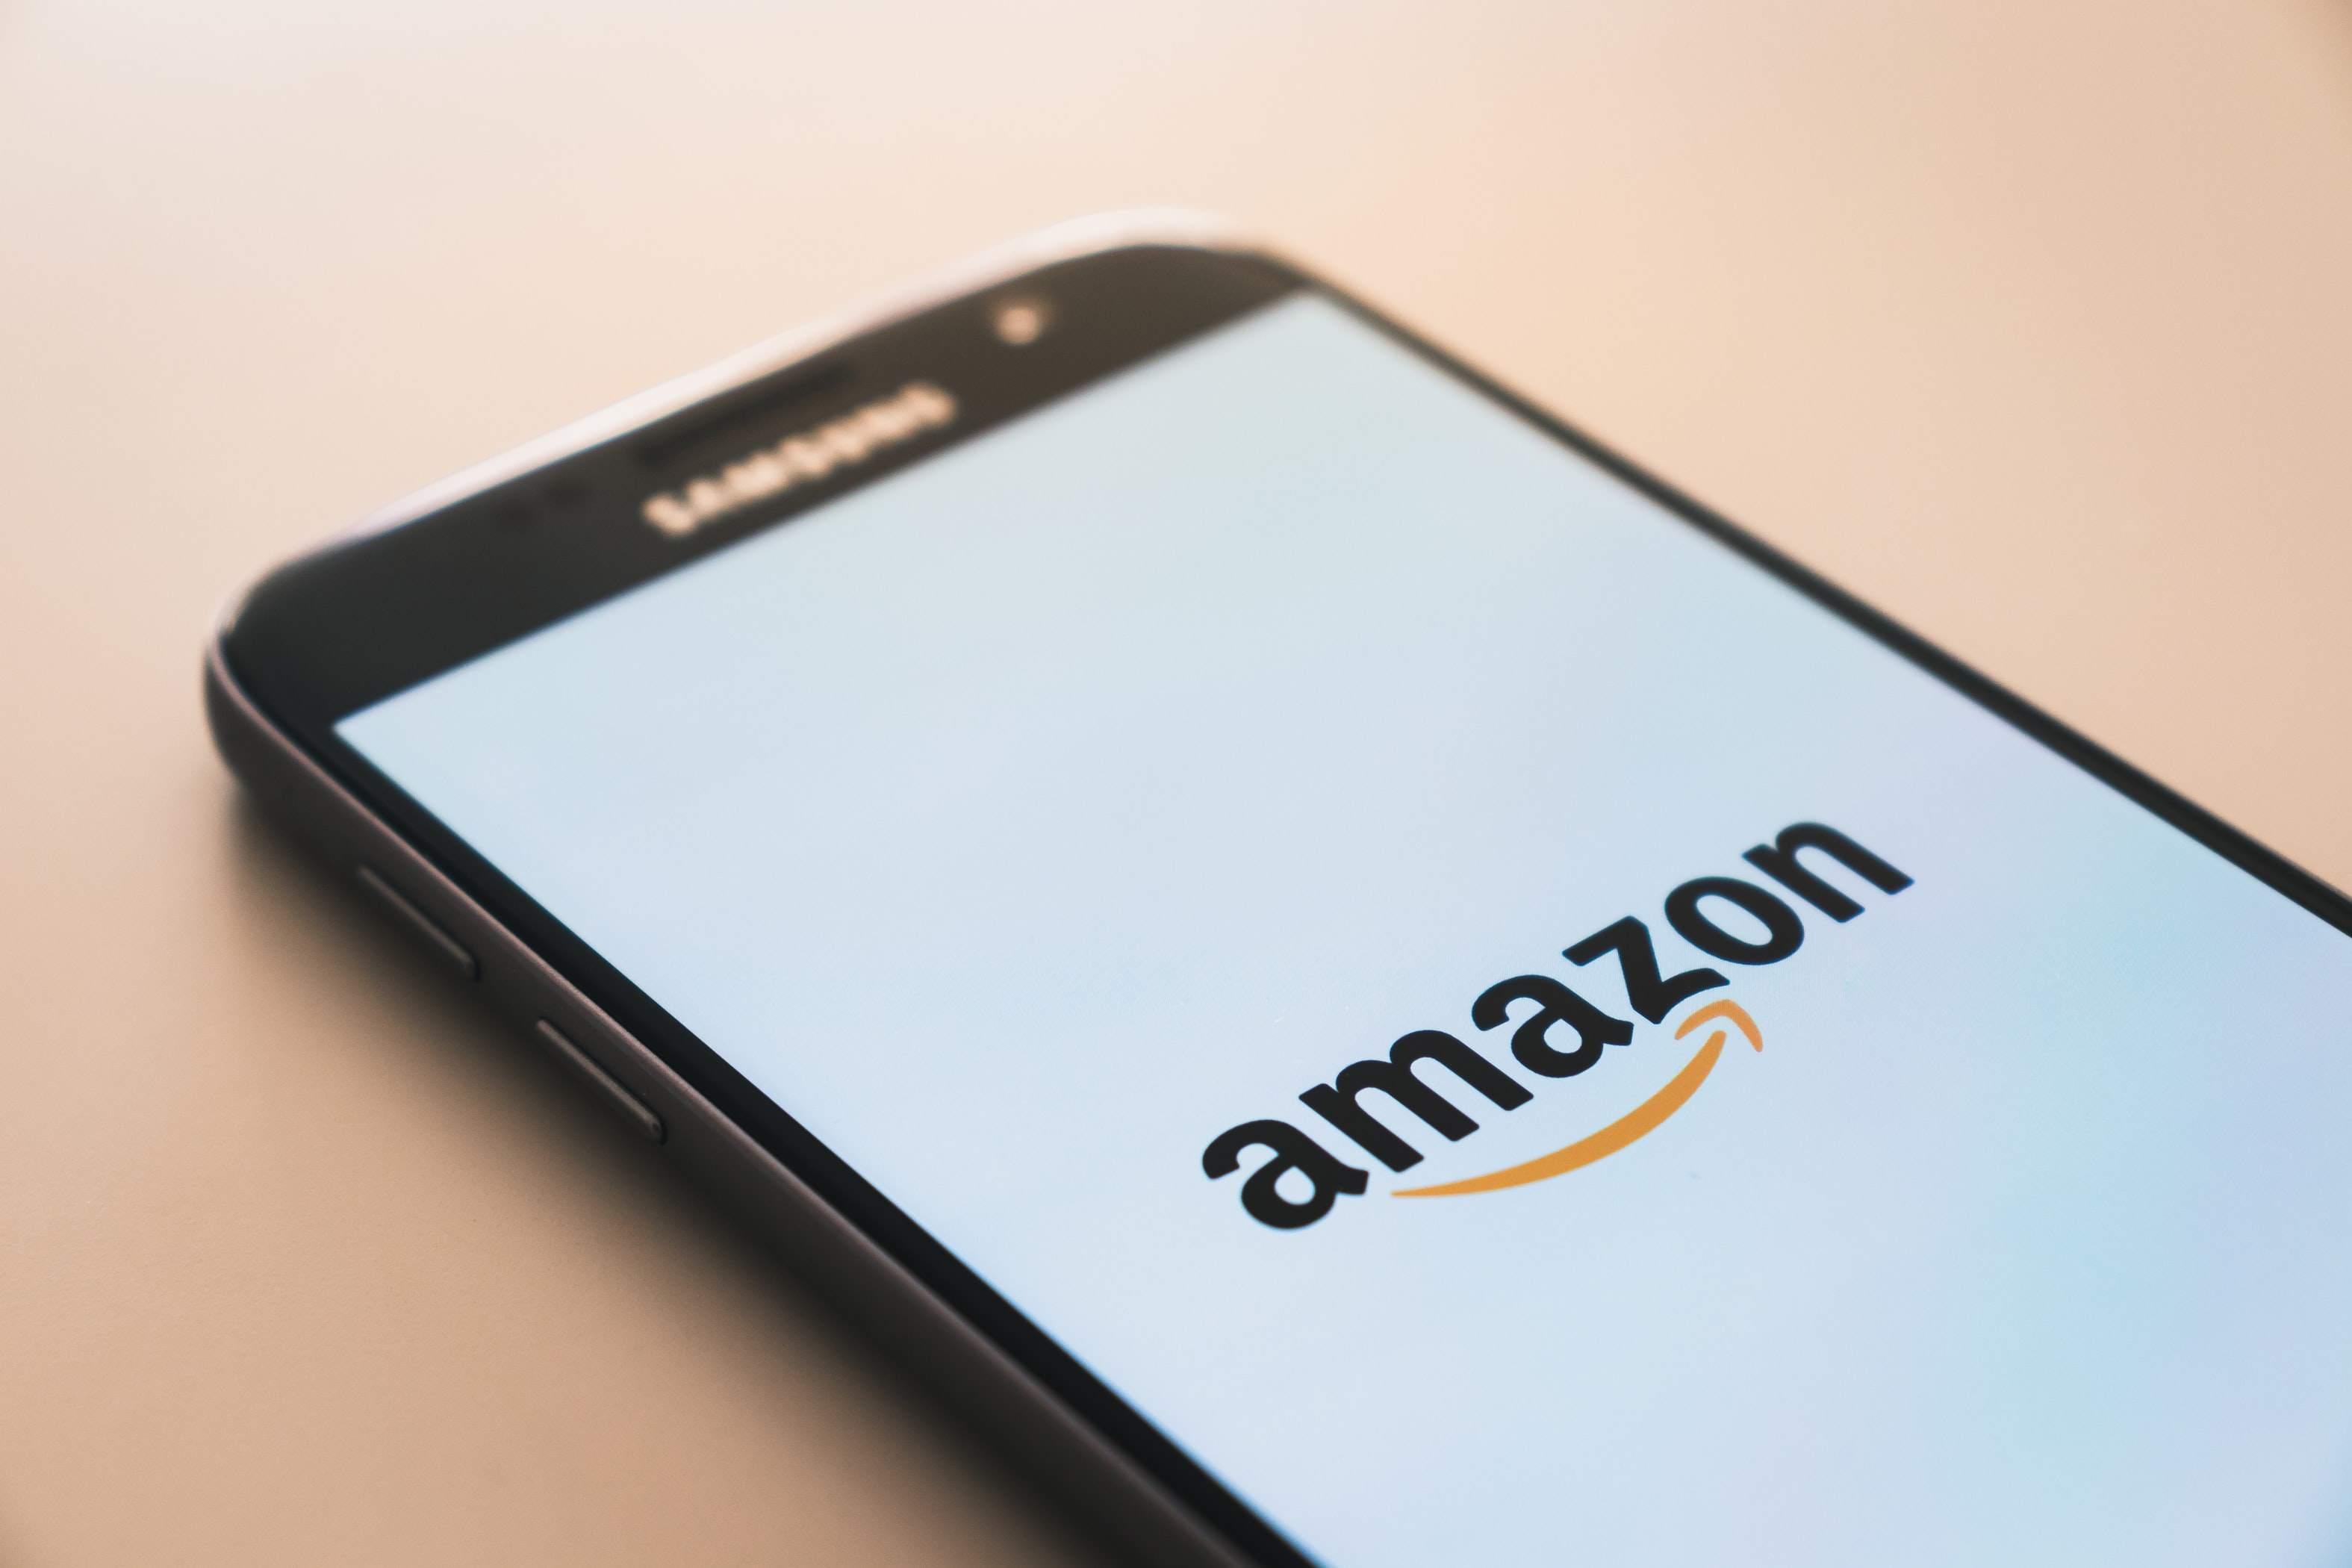 Smartphone mit Amazon App - heute Abend Amazon-Quartalszahlen